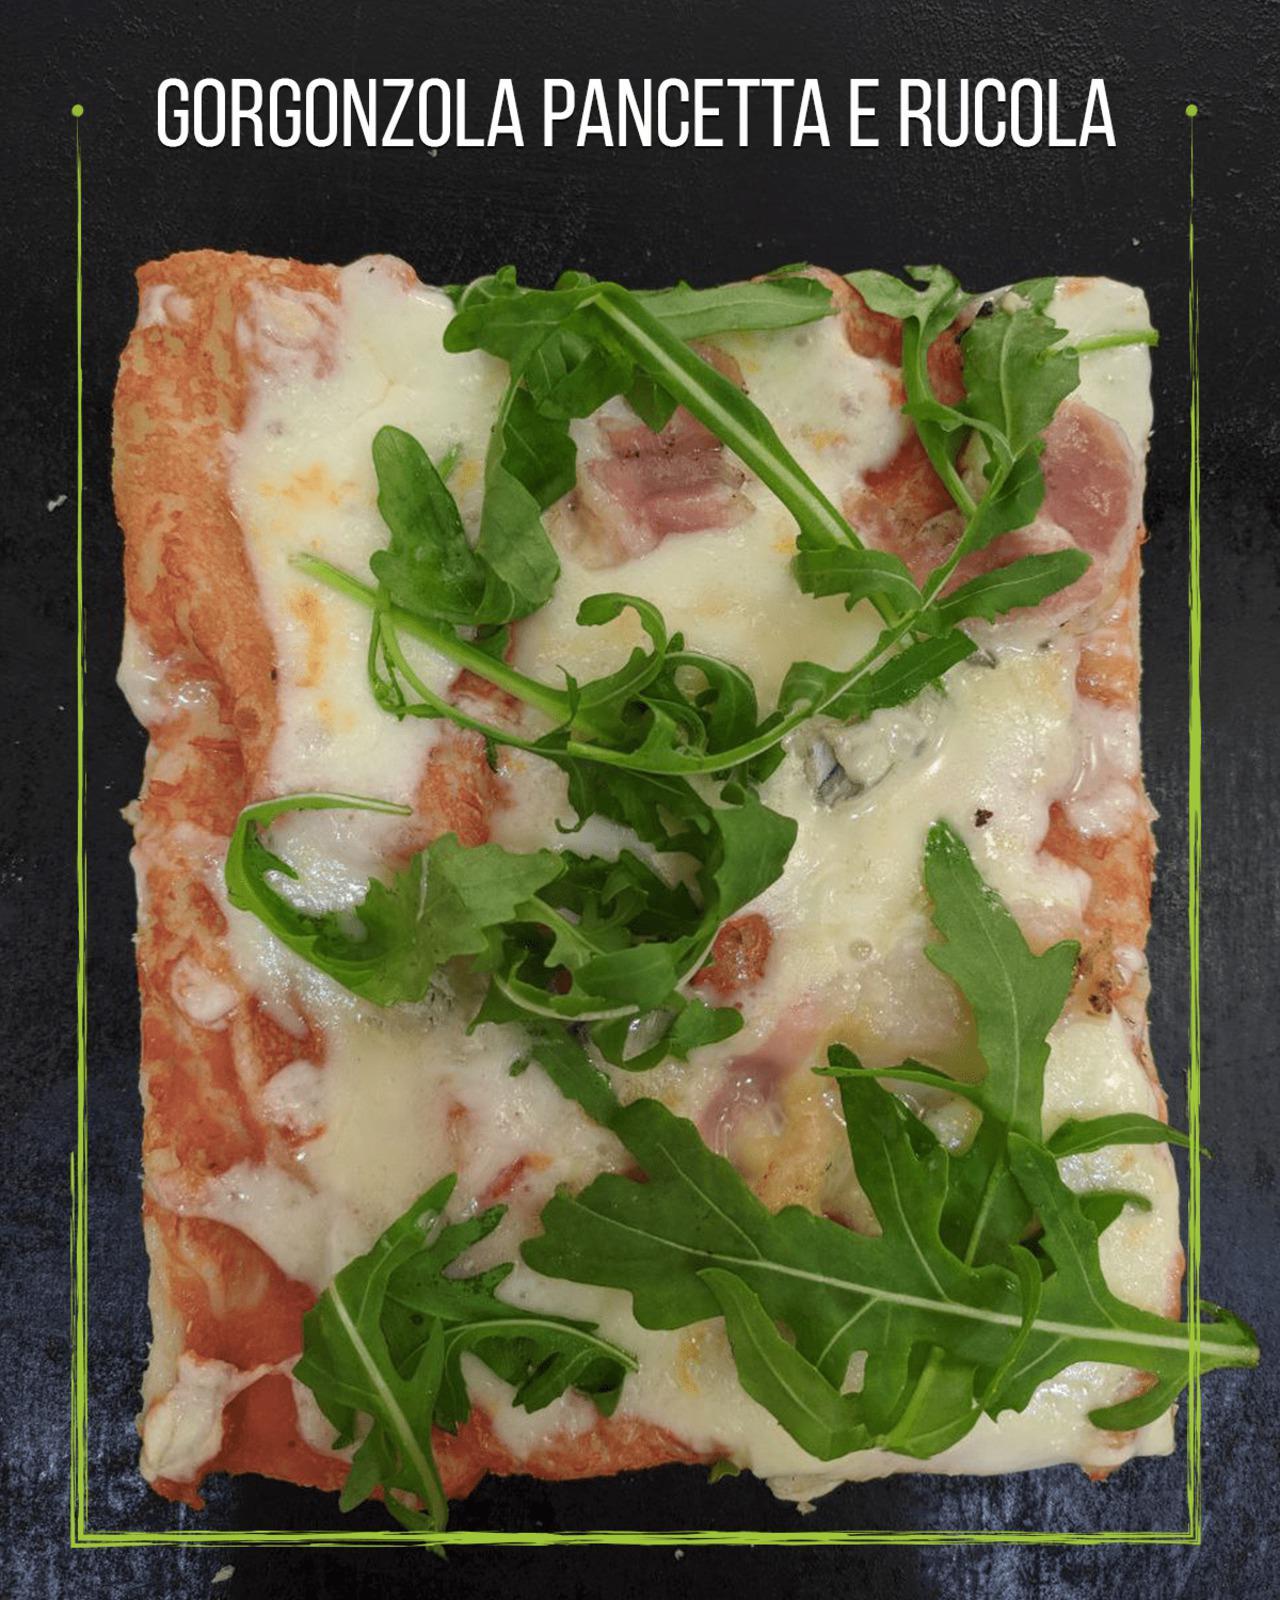 Gorgonzola-pancetta e rucola